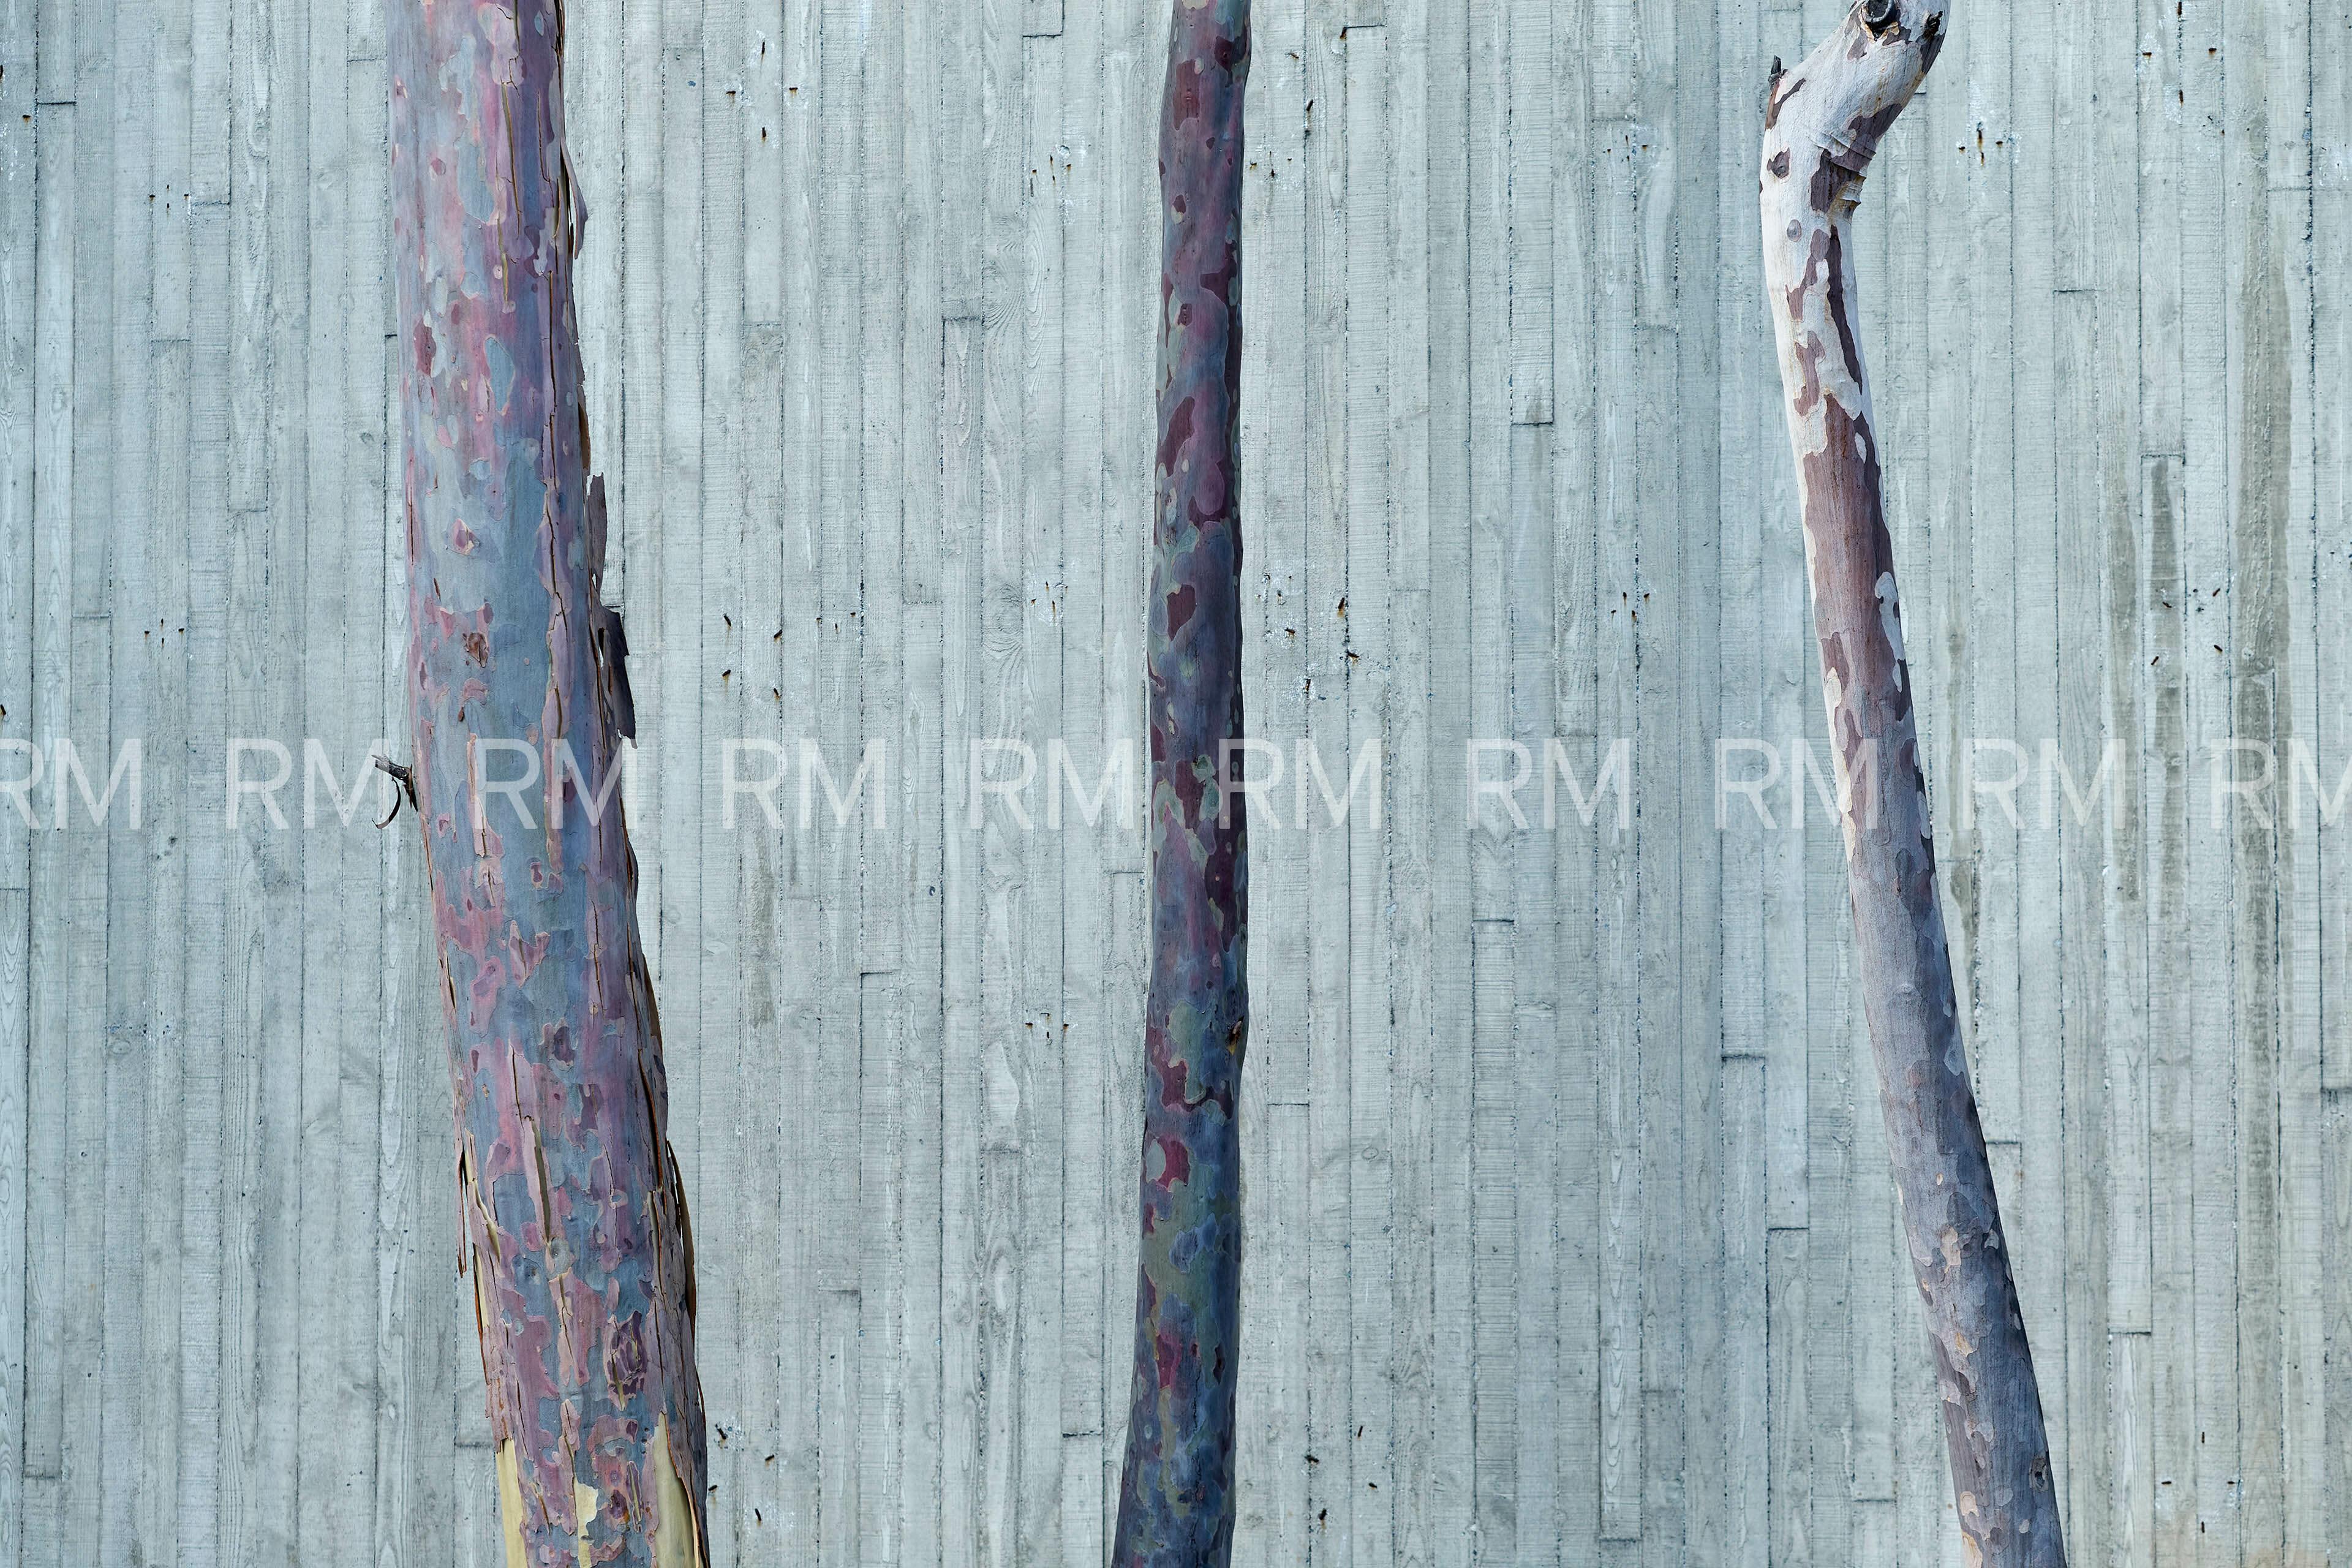 Richard Moran Environment 054